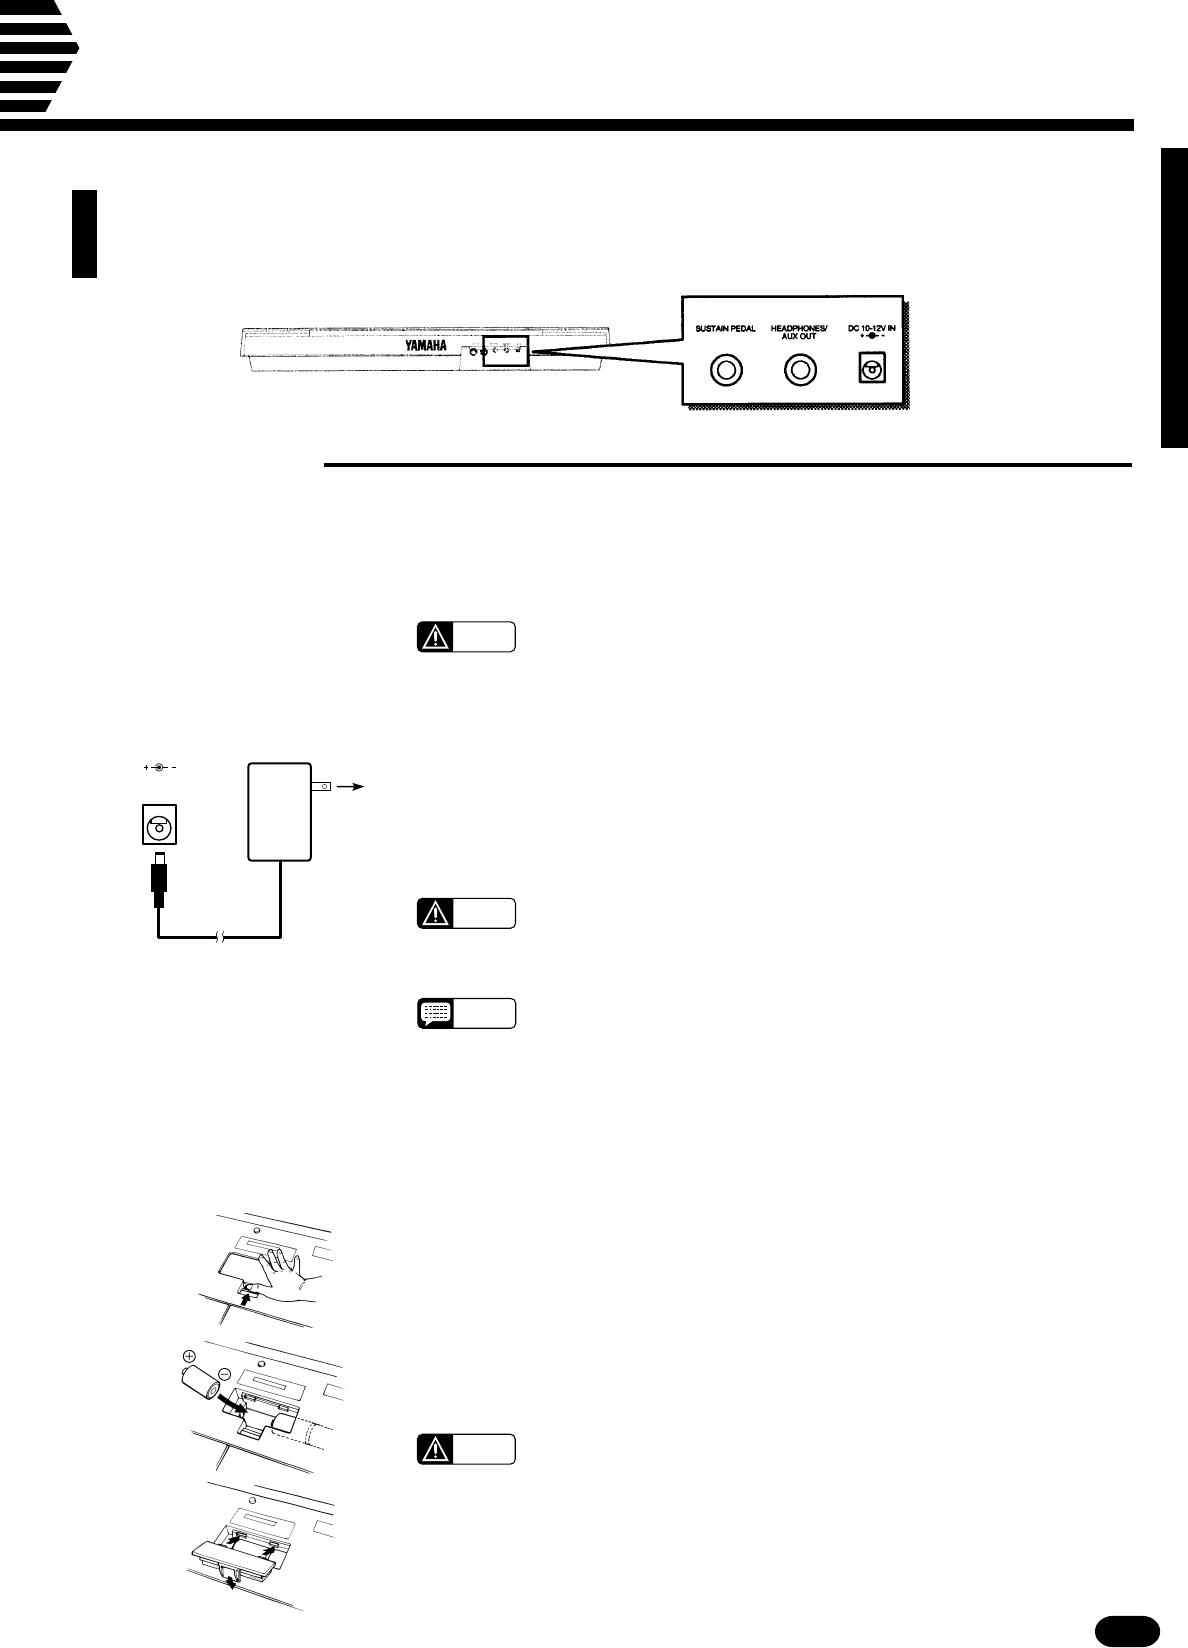 Handleiding Yamaha Psr 510 Pagina 5 Van 77 English Fc5 Pedal Wiring Diagram